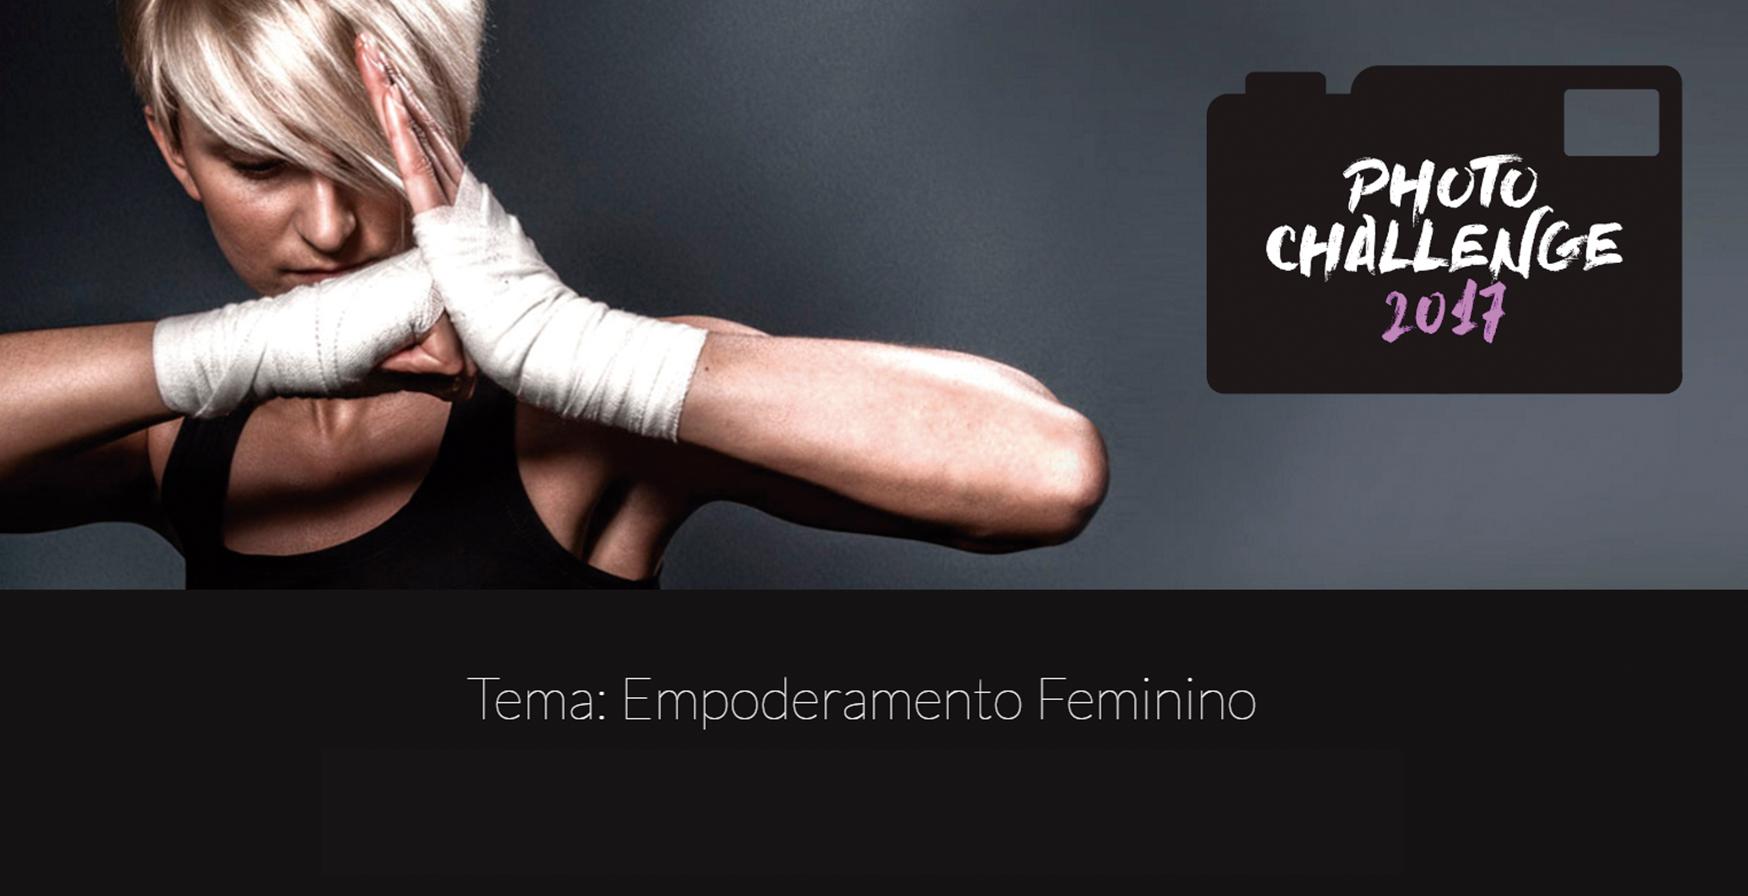 Edital Empoderamento Feminino – Photo Challenge 2017